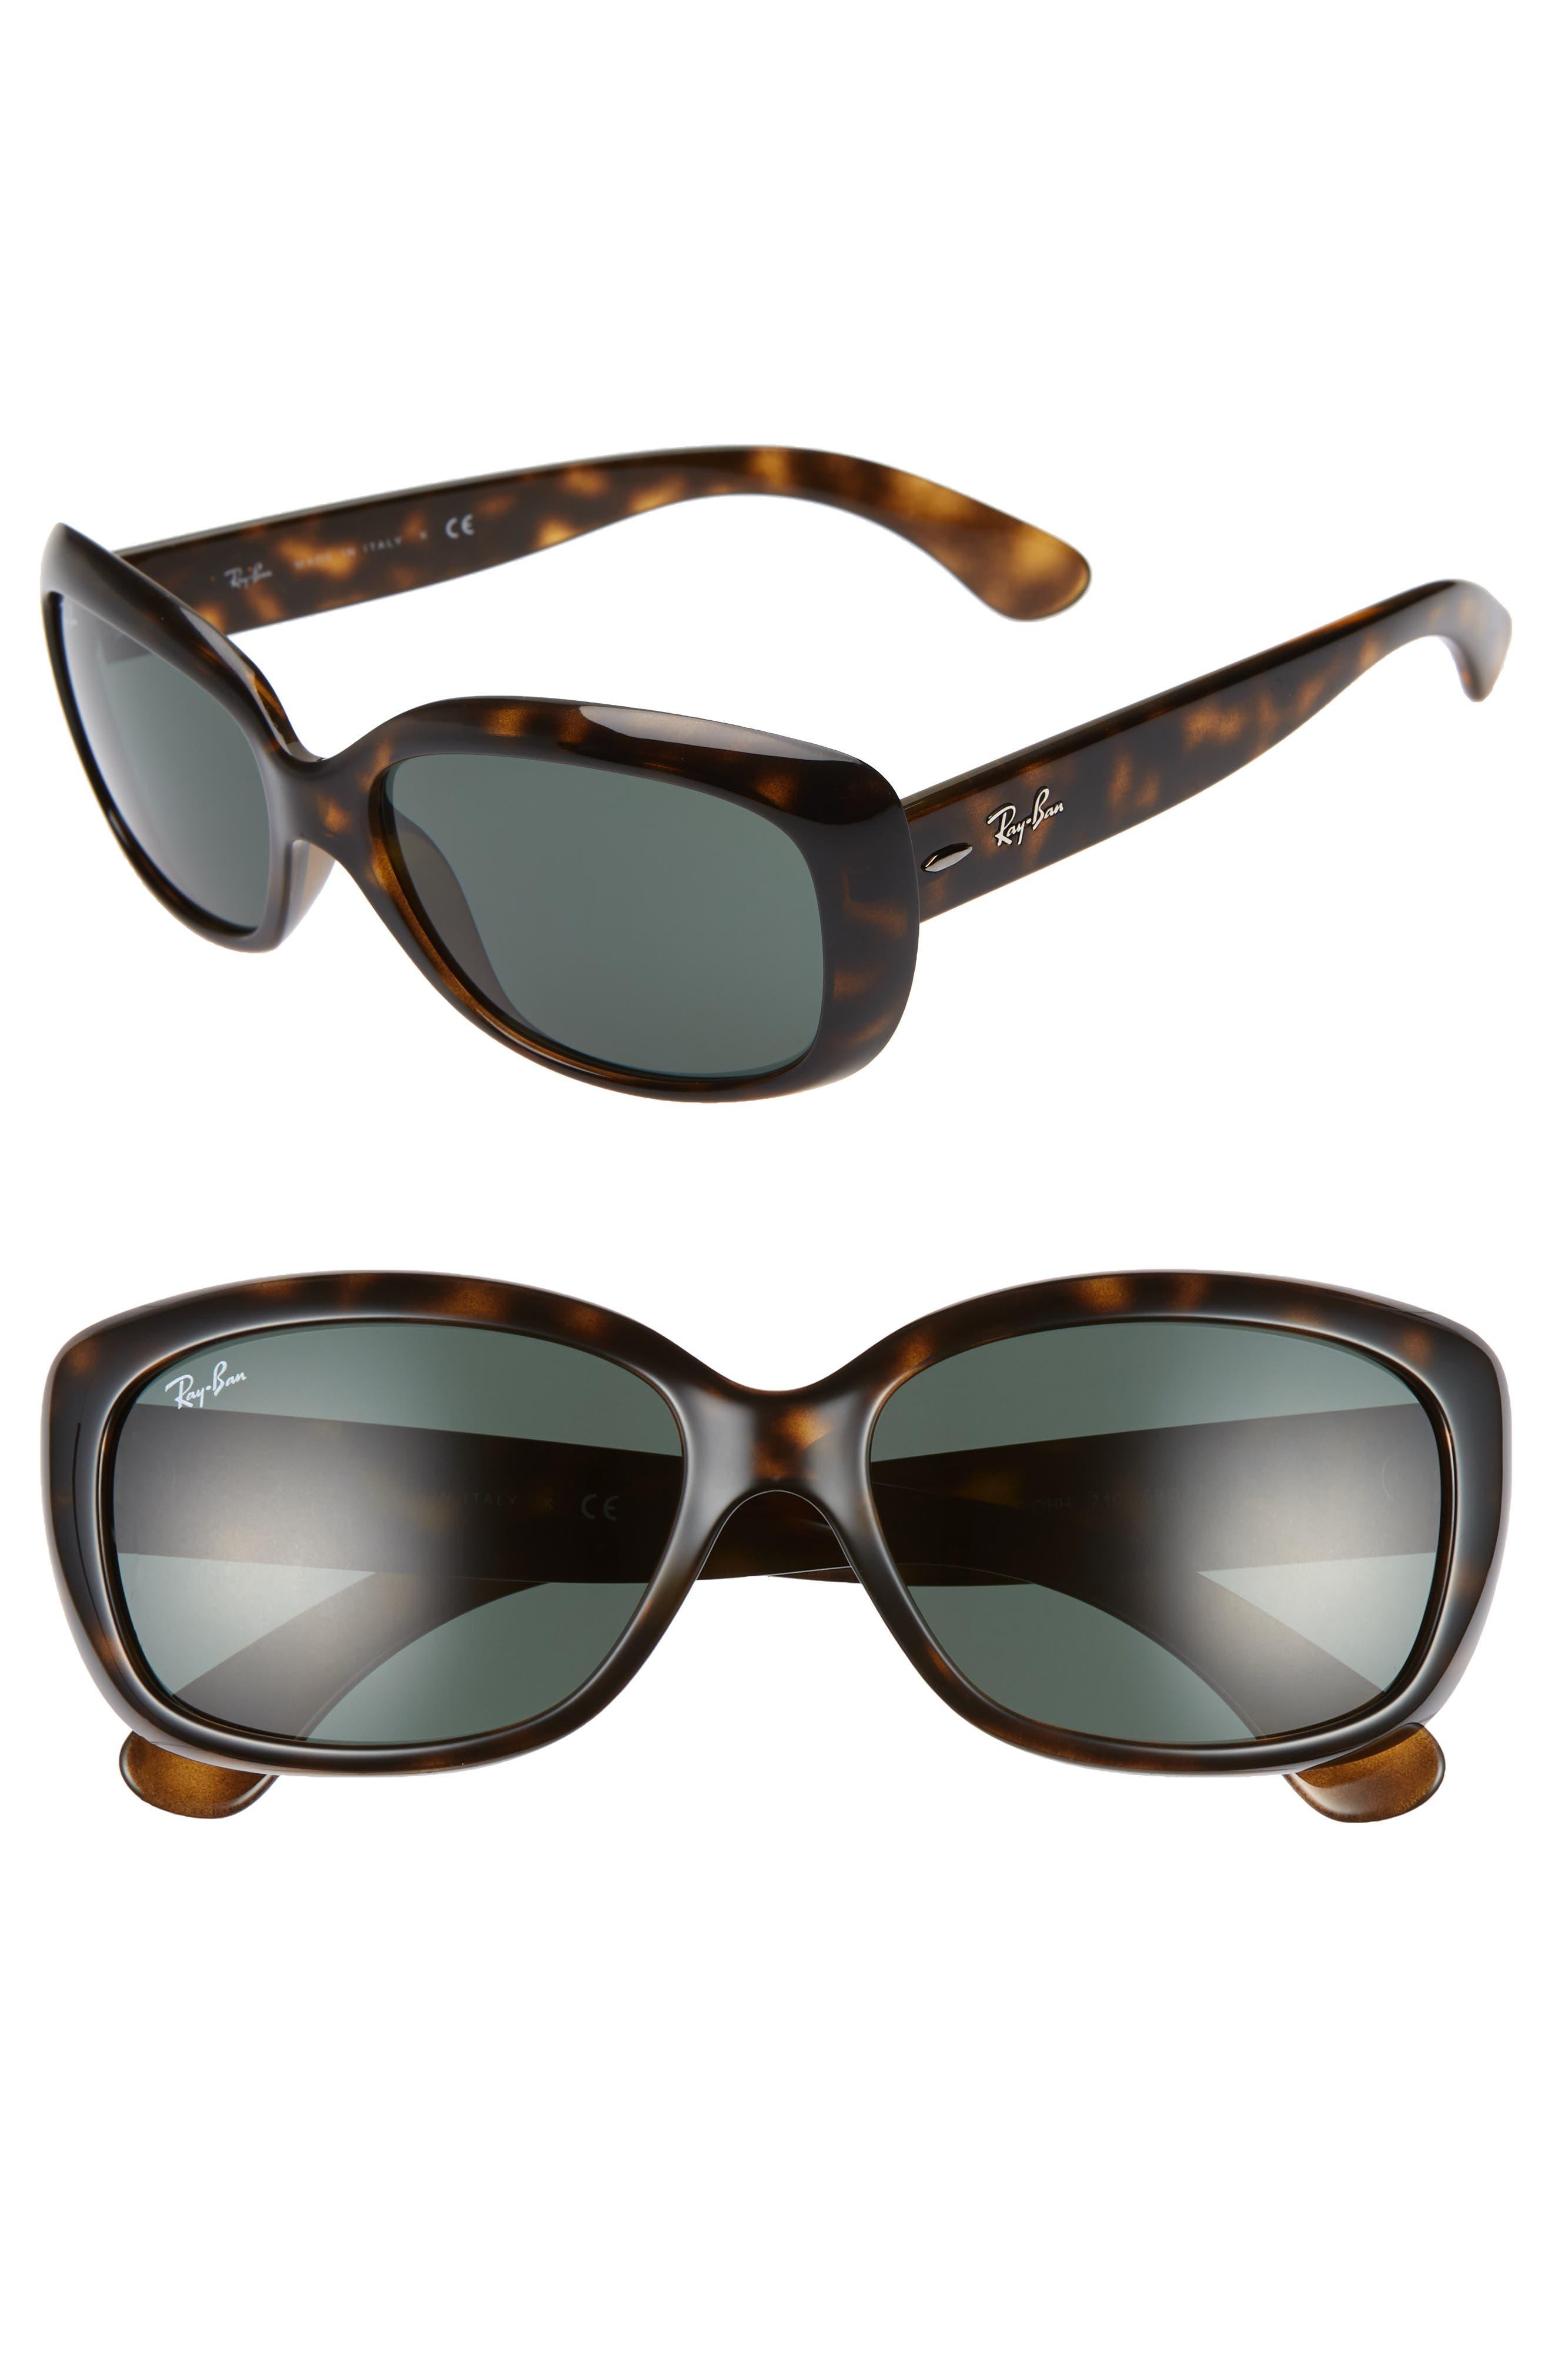 RAY-BAN, Jackie Ohh 58mm Cat Eye Sunglasses, Main thumbnail 1, color, LITE HAVANA/ GREEN SOLID